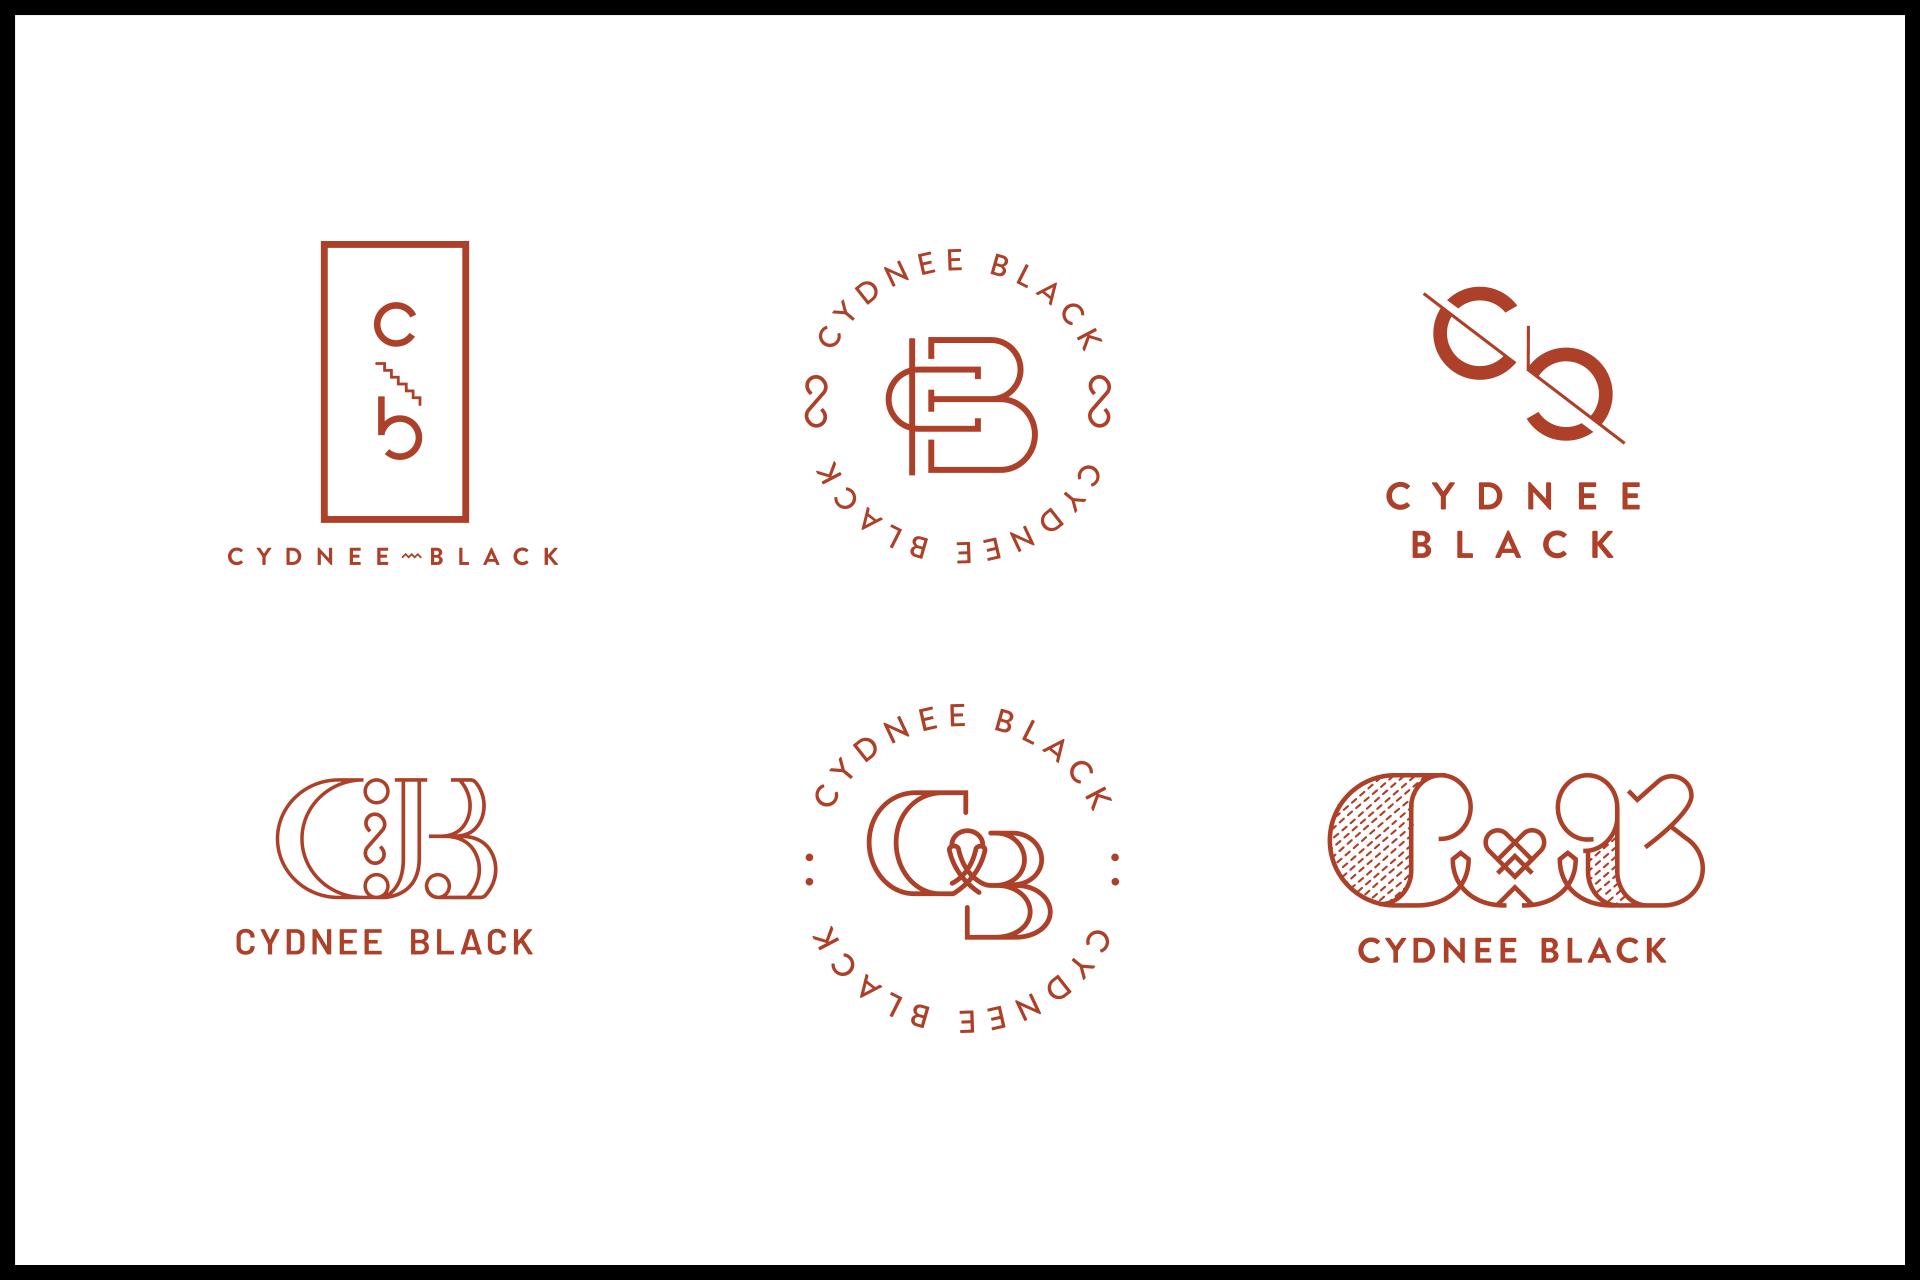 03_CydneeBlack-Identity.png